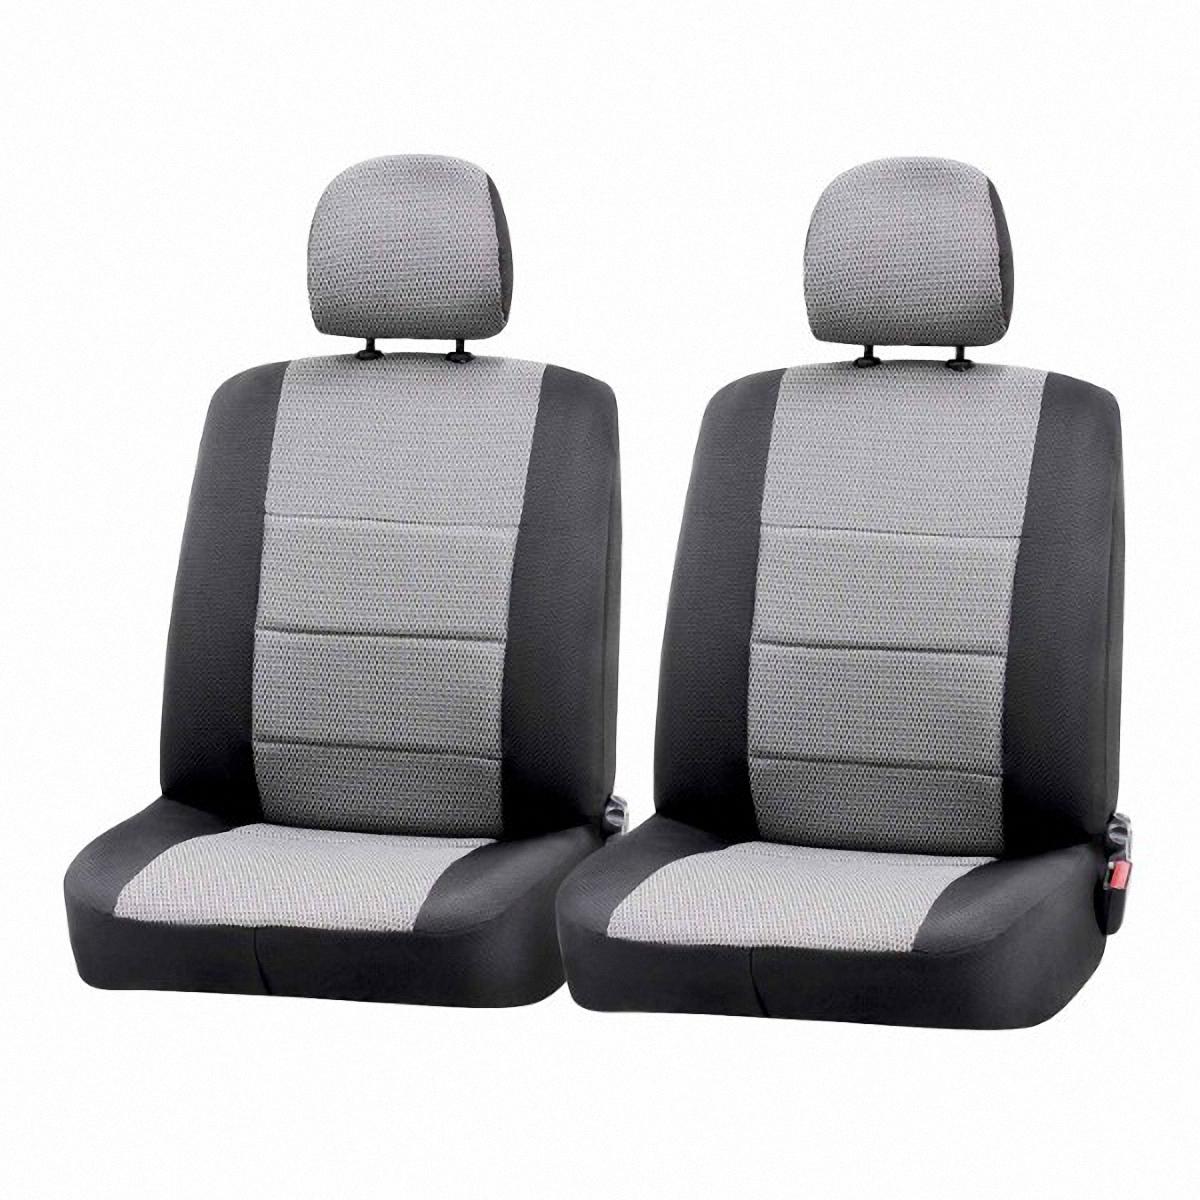 Чехол на сиденье Skyway Renault Logan. Rn3-1 чехол на сиденье skyway toyota corolla седан ty1 2k